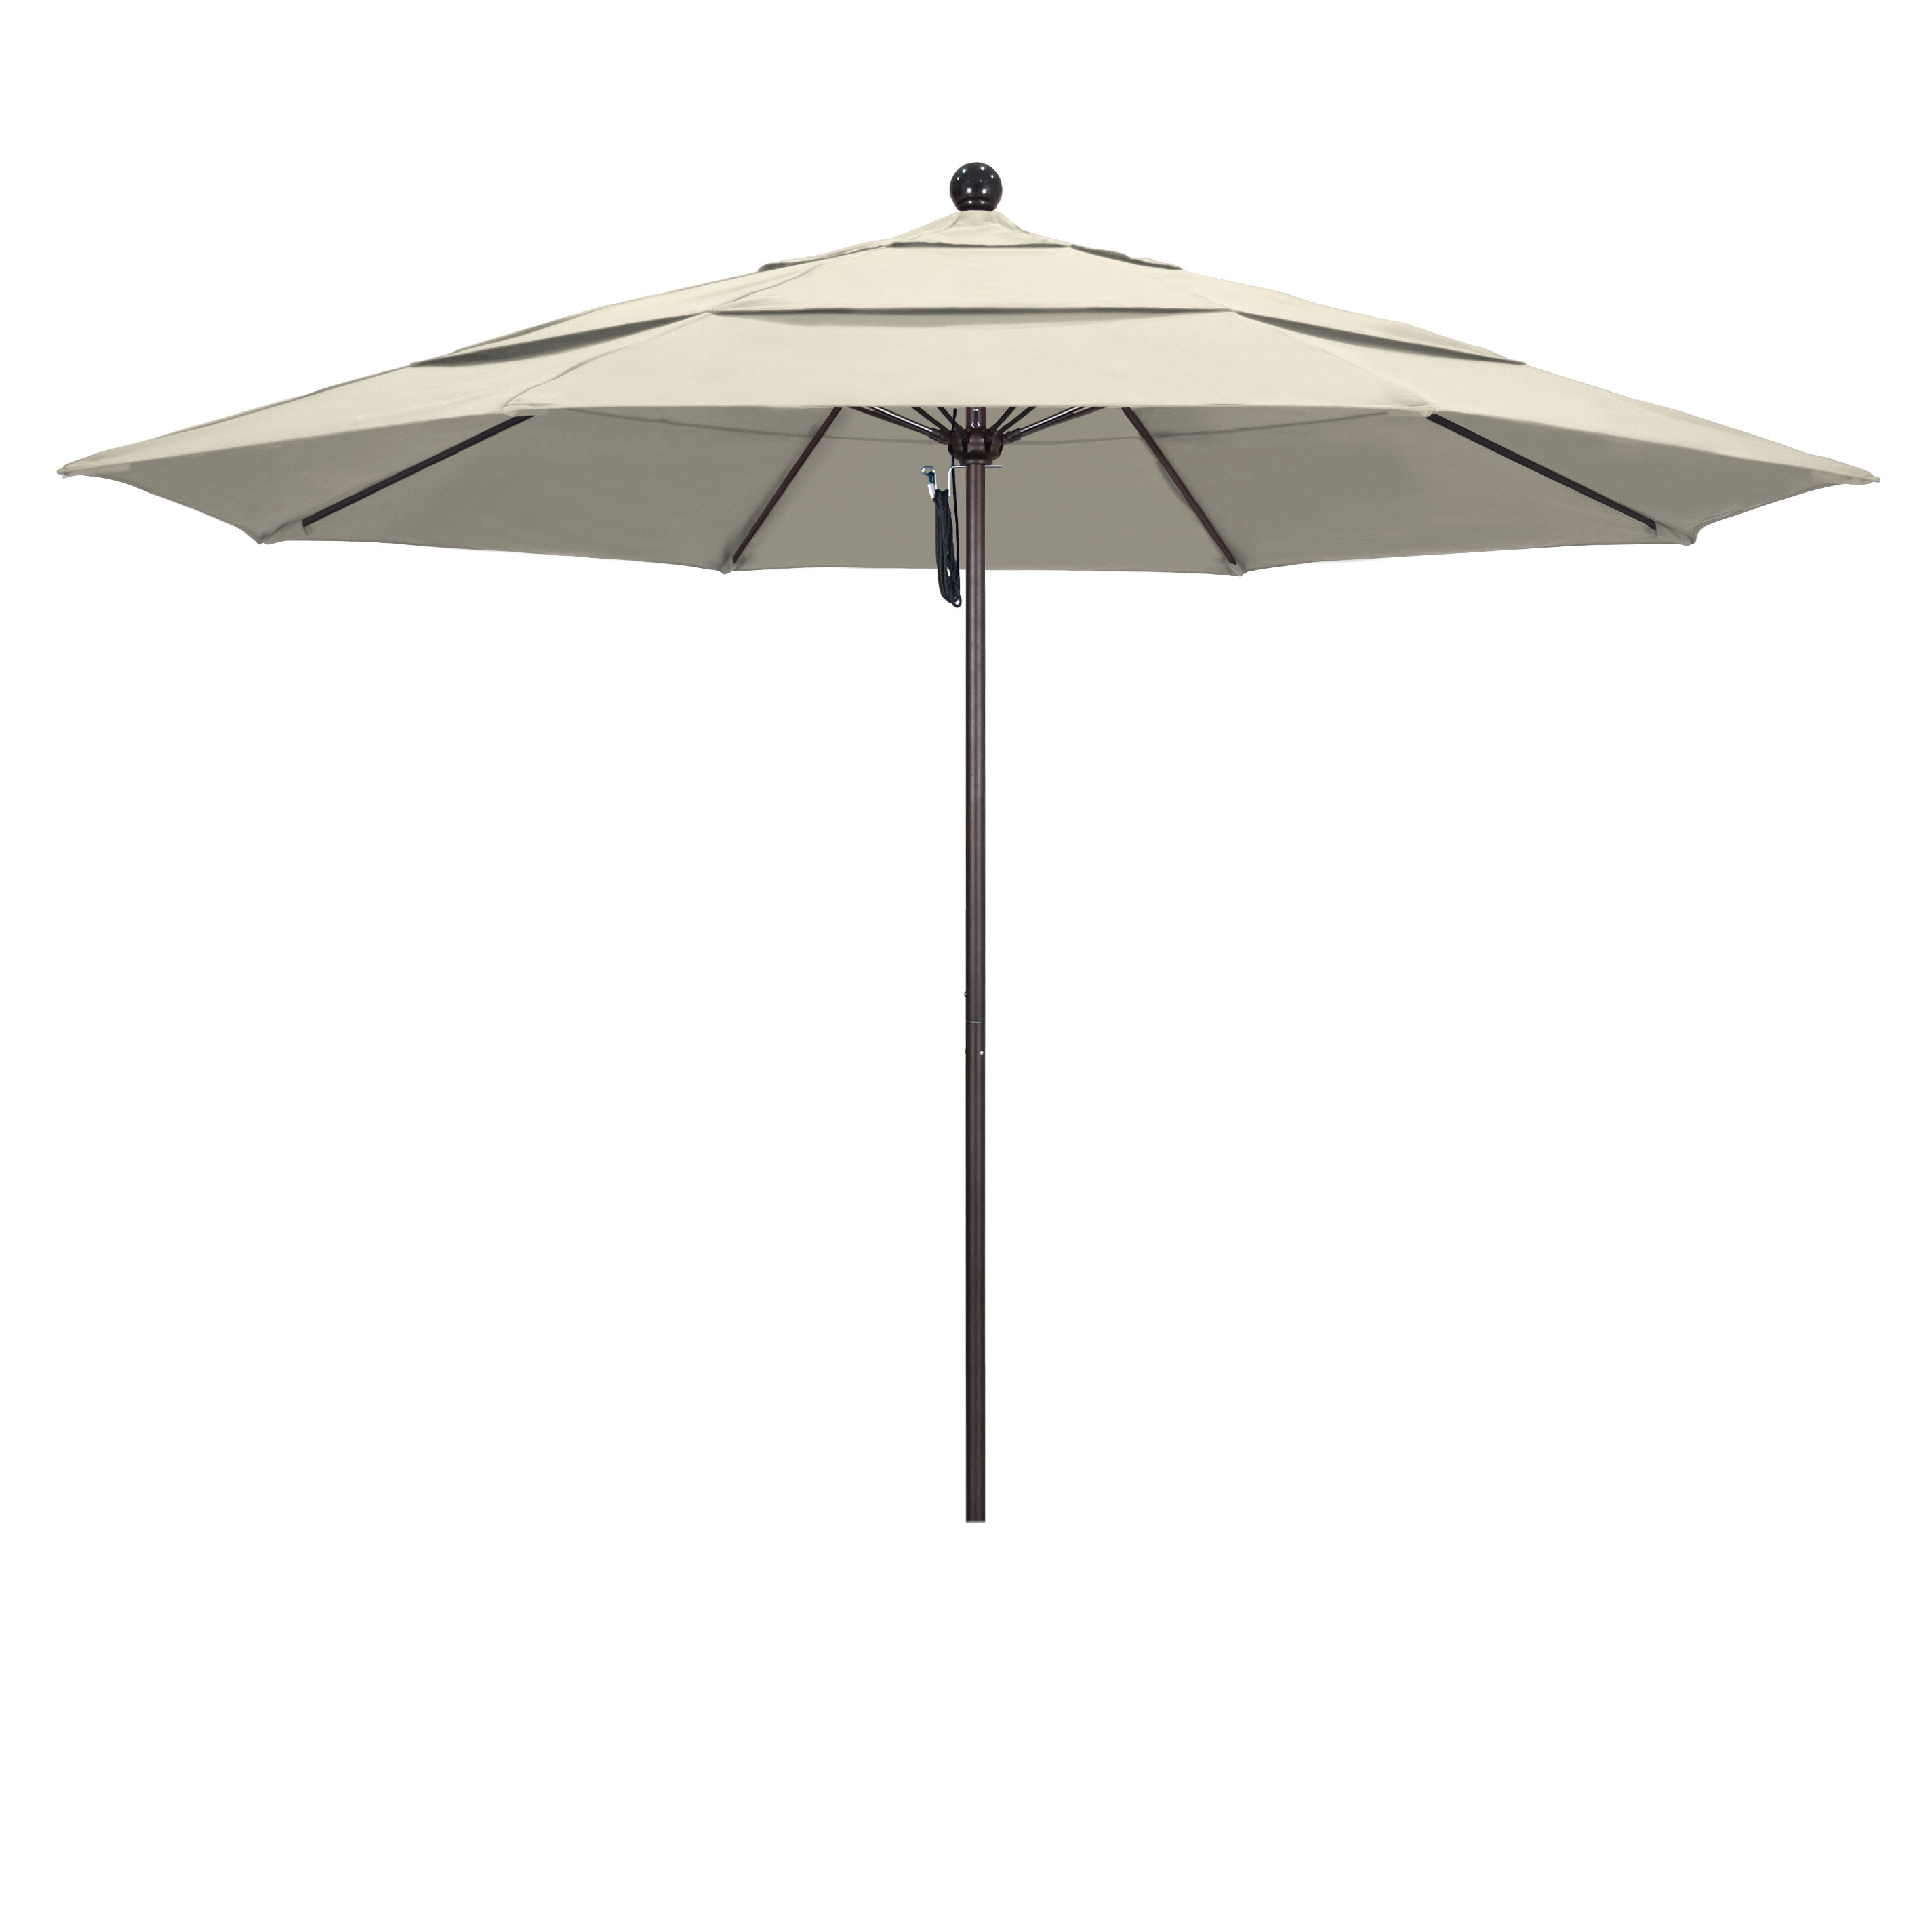 Most Up To Date Duxbury 11' Market Umbrella Pertaining To Mullaney Market Sunbrella Umbrellas (View 8 of 20)